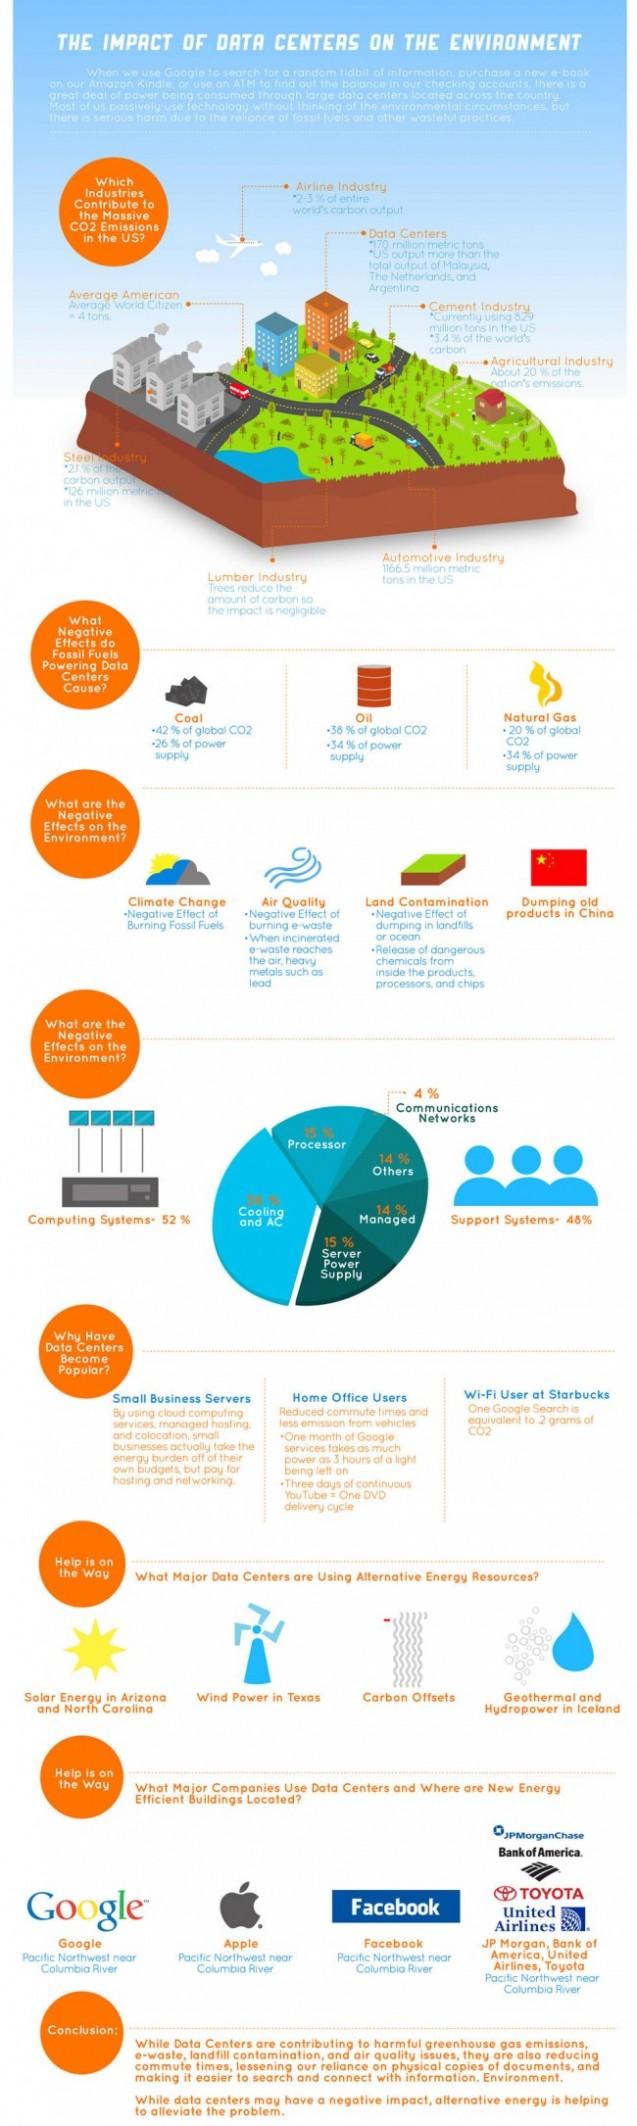 Impact Of Data Centers